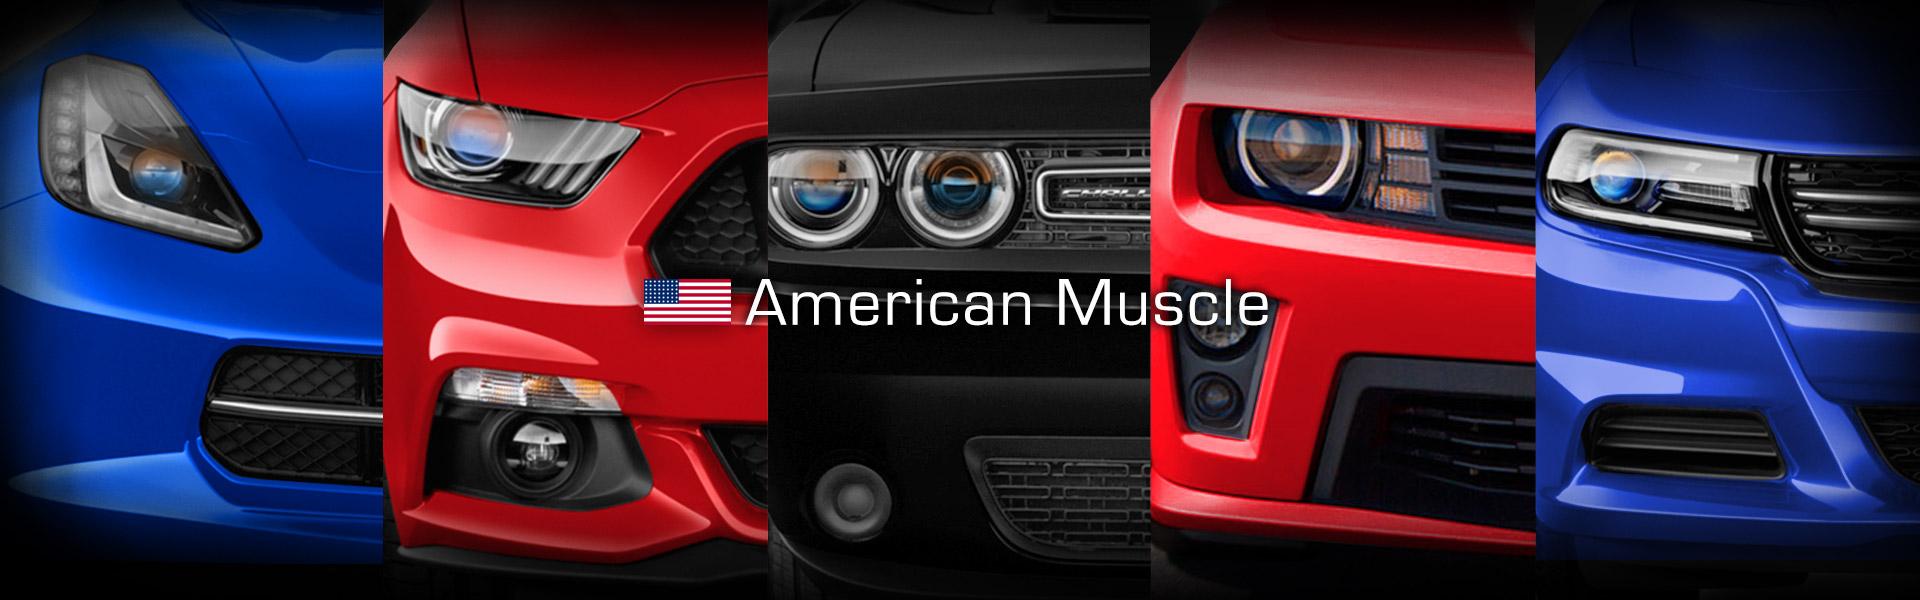 American-MuscleHeader